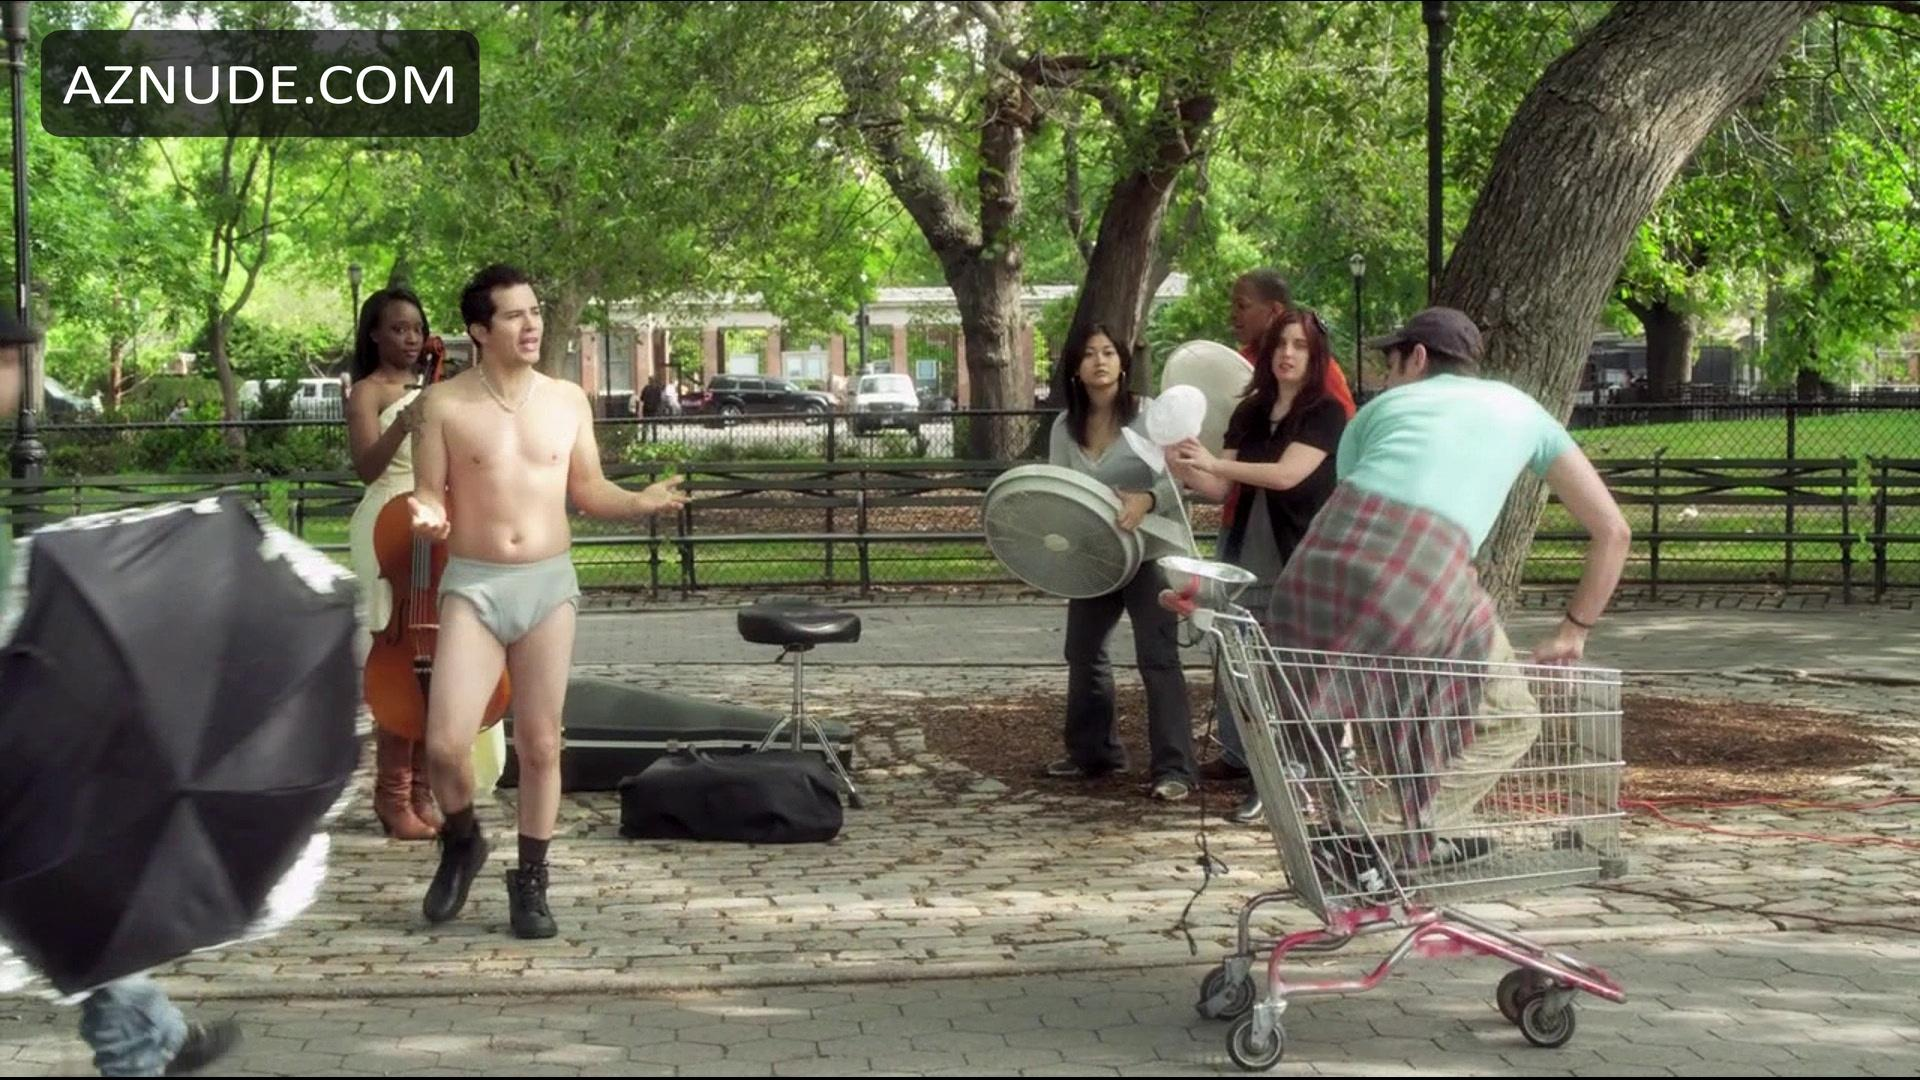 Naked john leguizamo